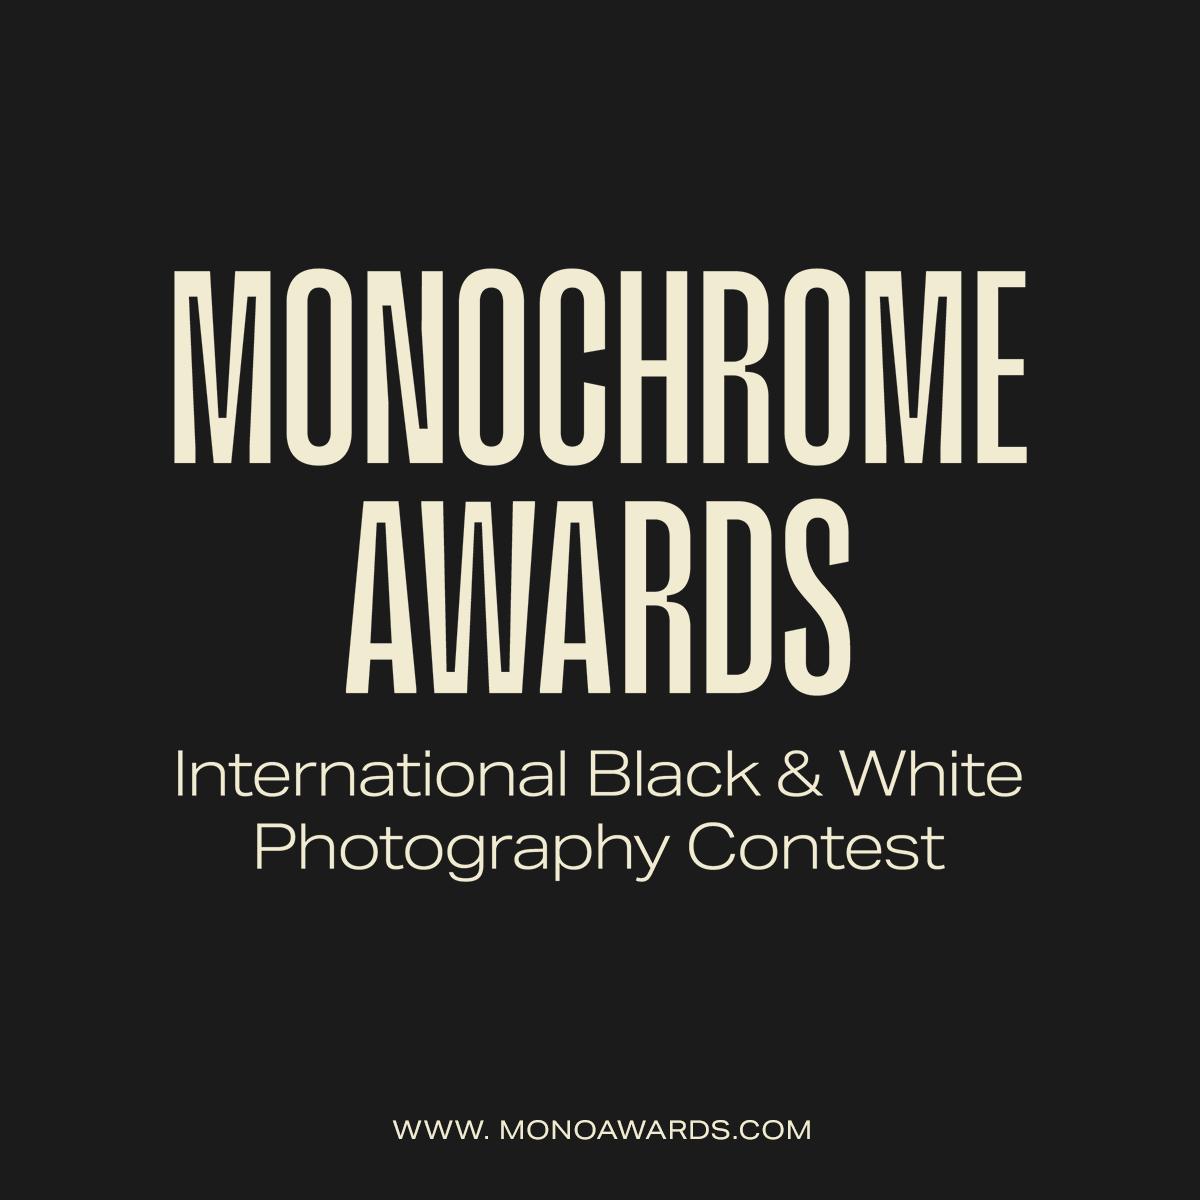 Monochrome Awards 2021 - logo